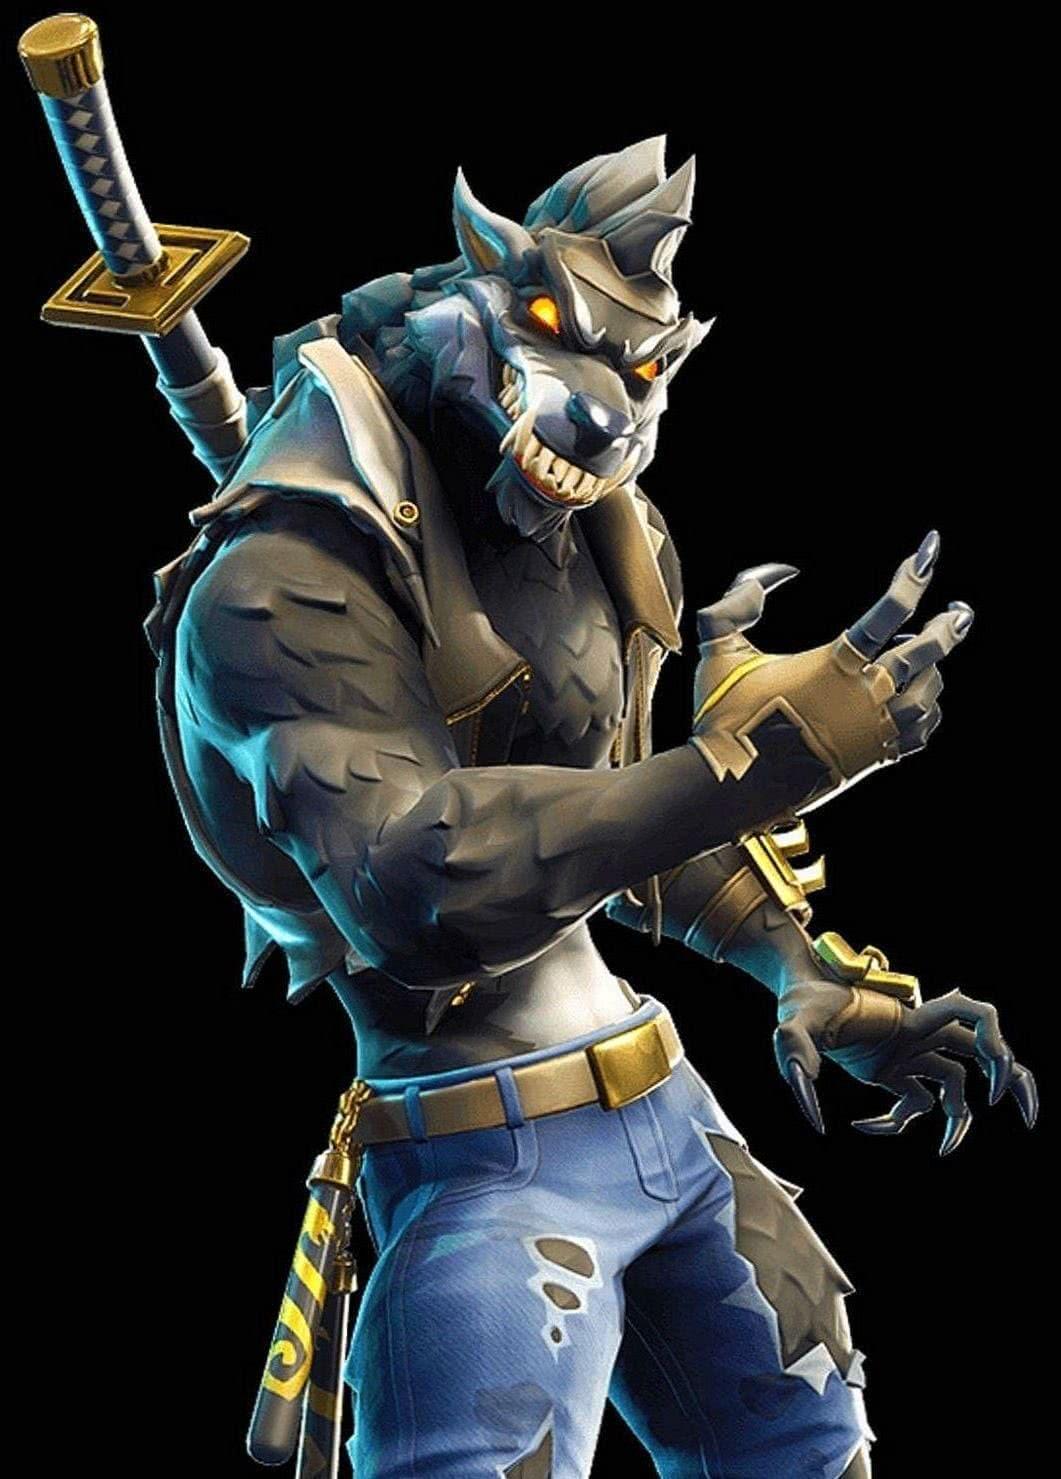 Fortnite Wallpaper Werewolf